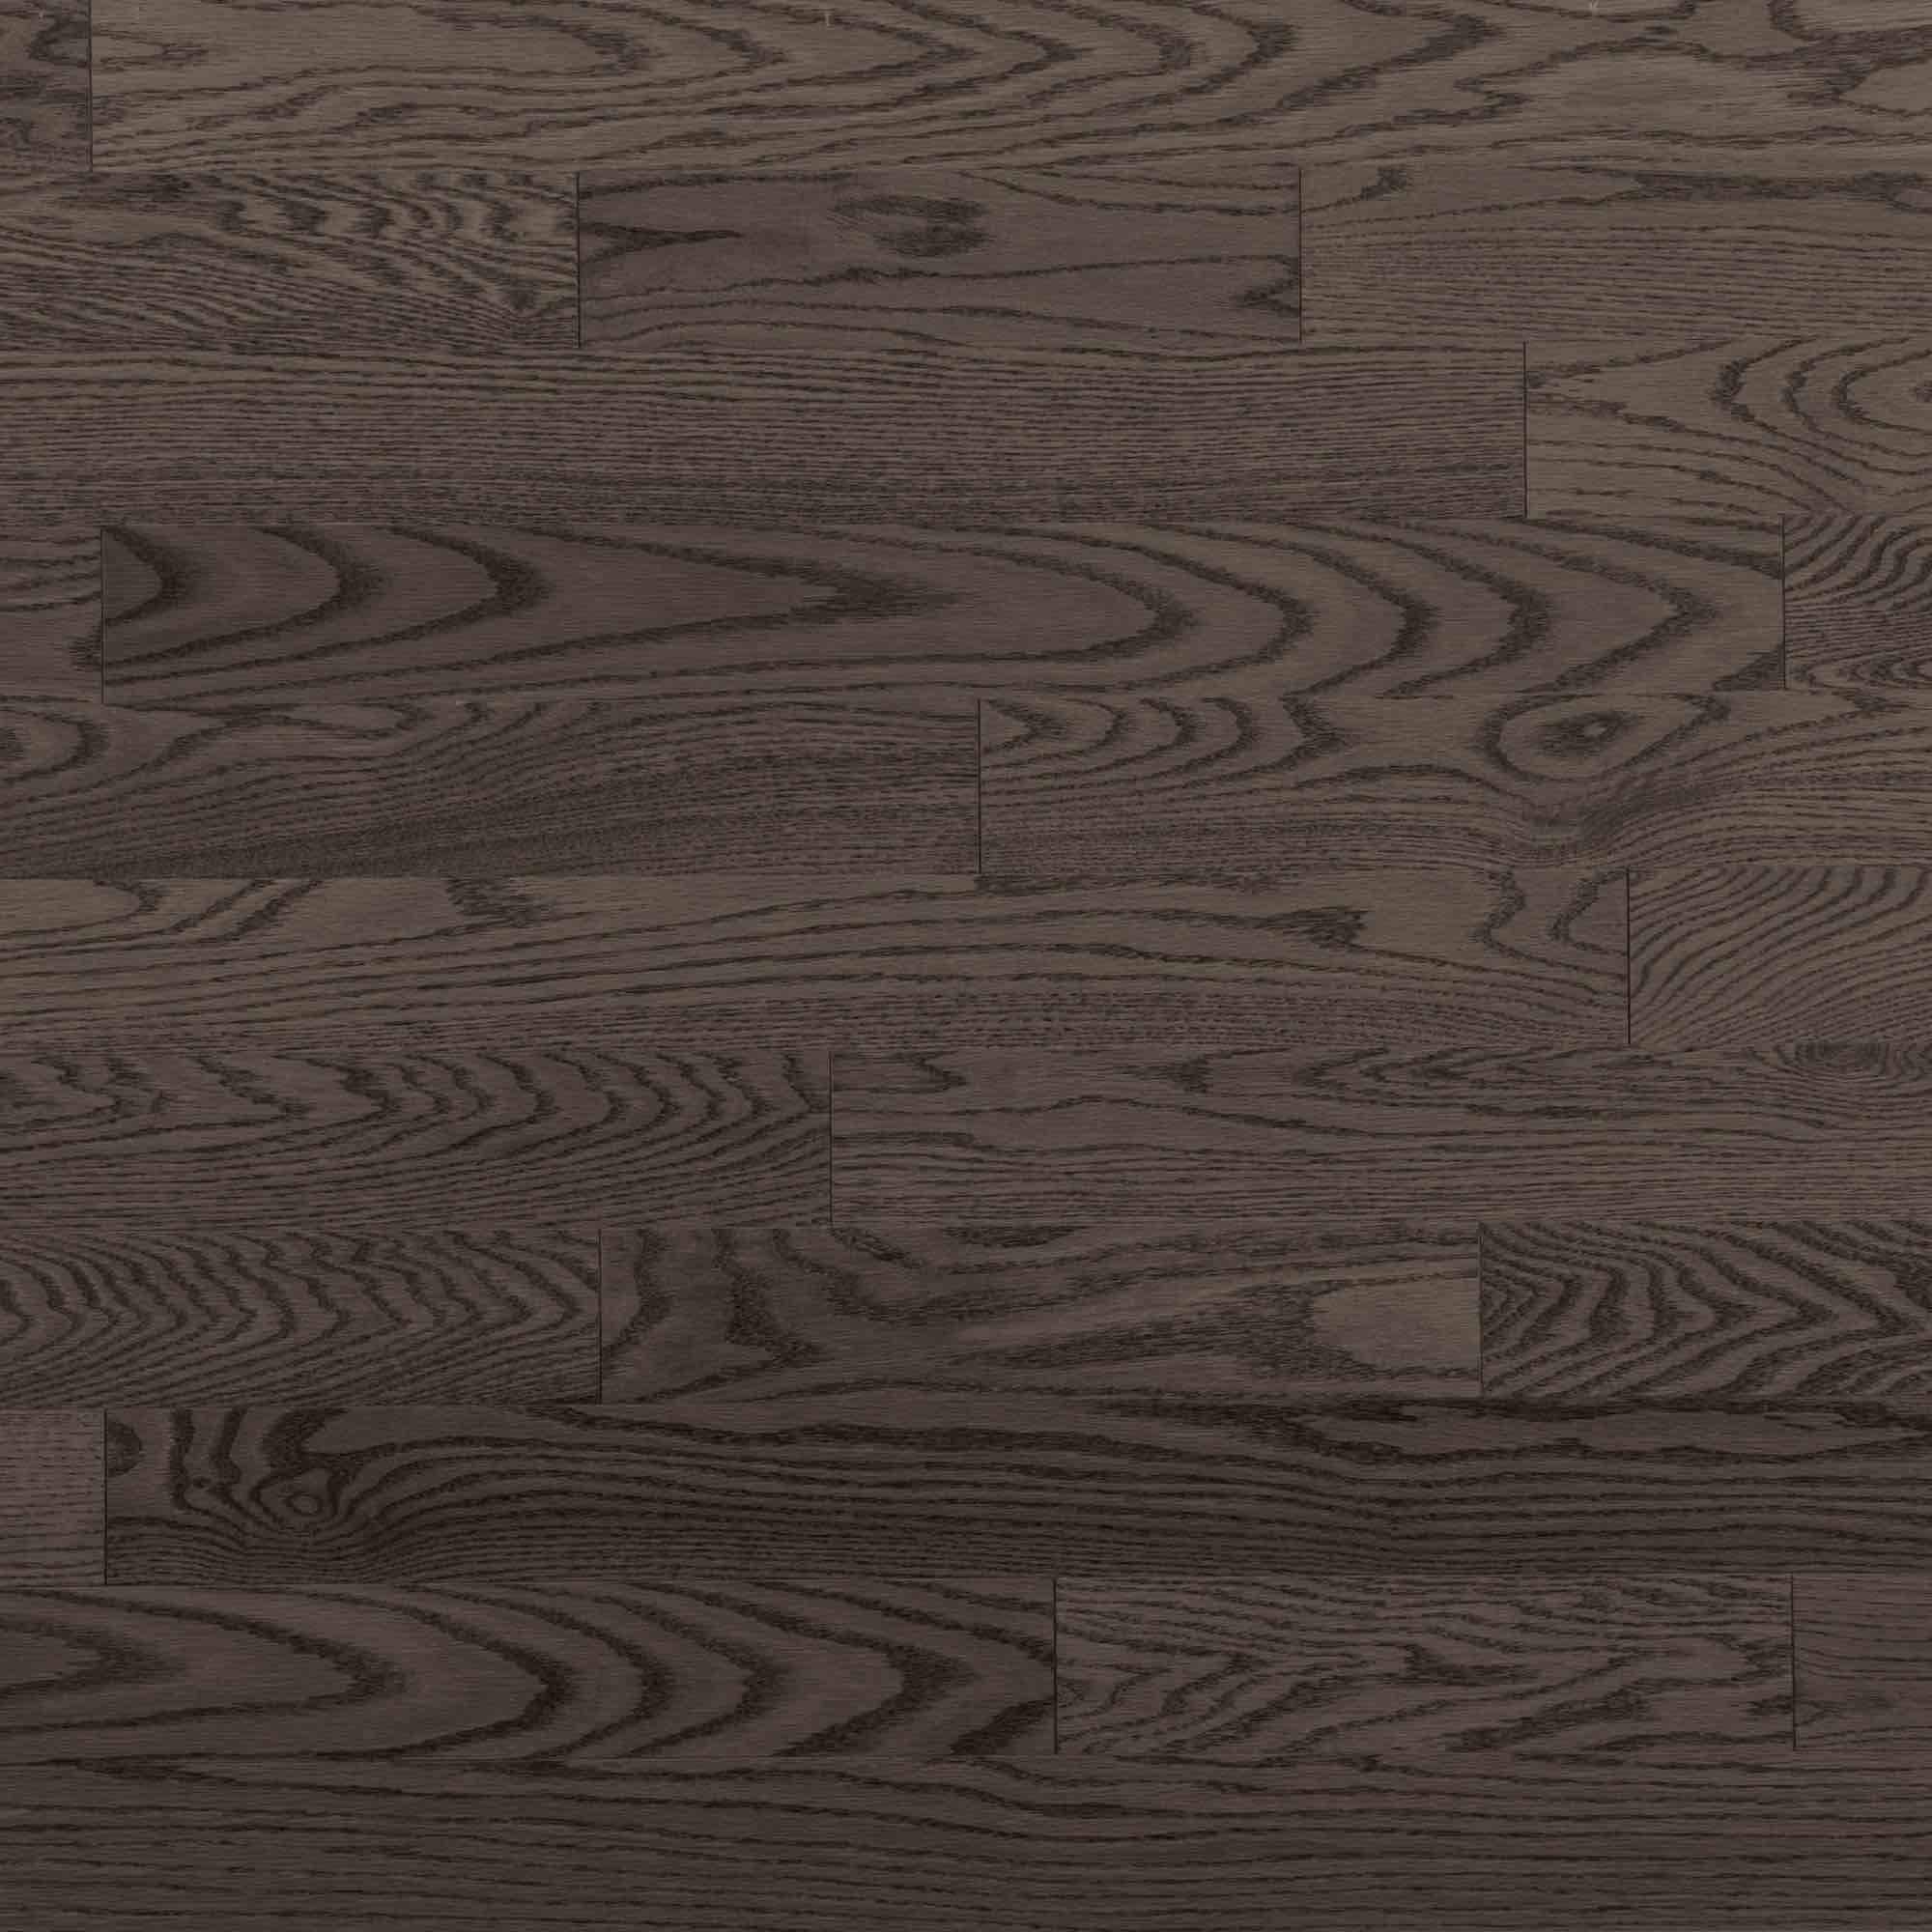 hardwood flooring showroom near me of hardwood westfloors west vancouver hardwood flooring carpet within featured hardwoods red oak charcoal